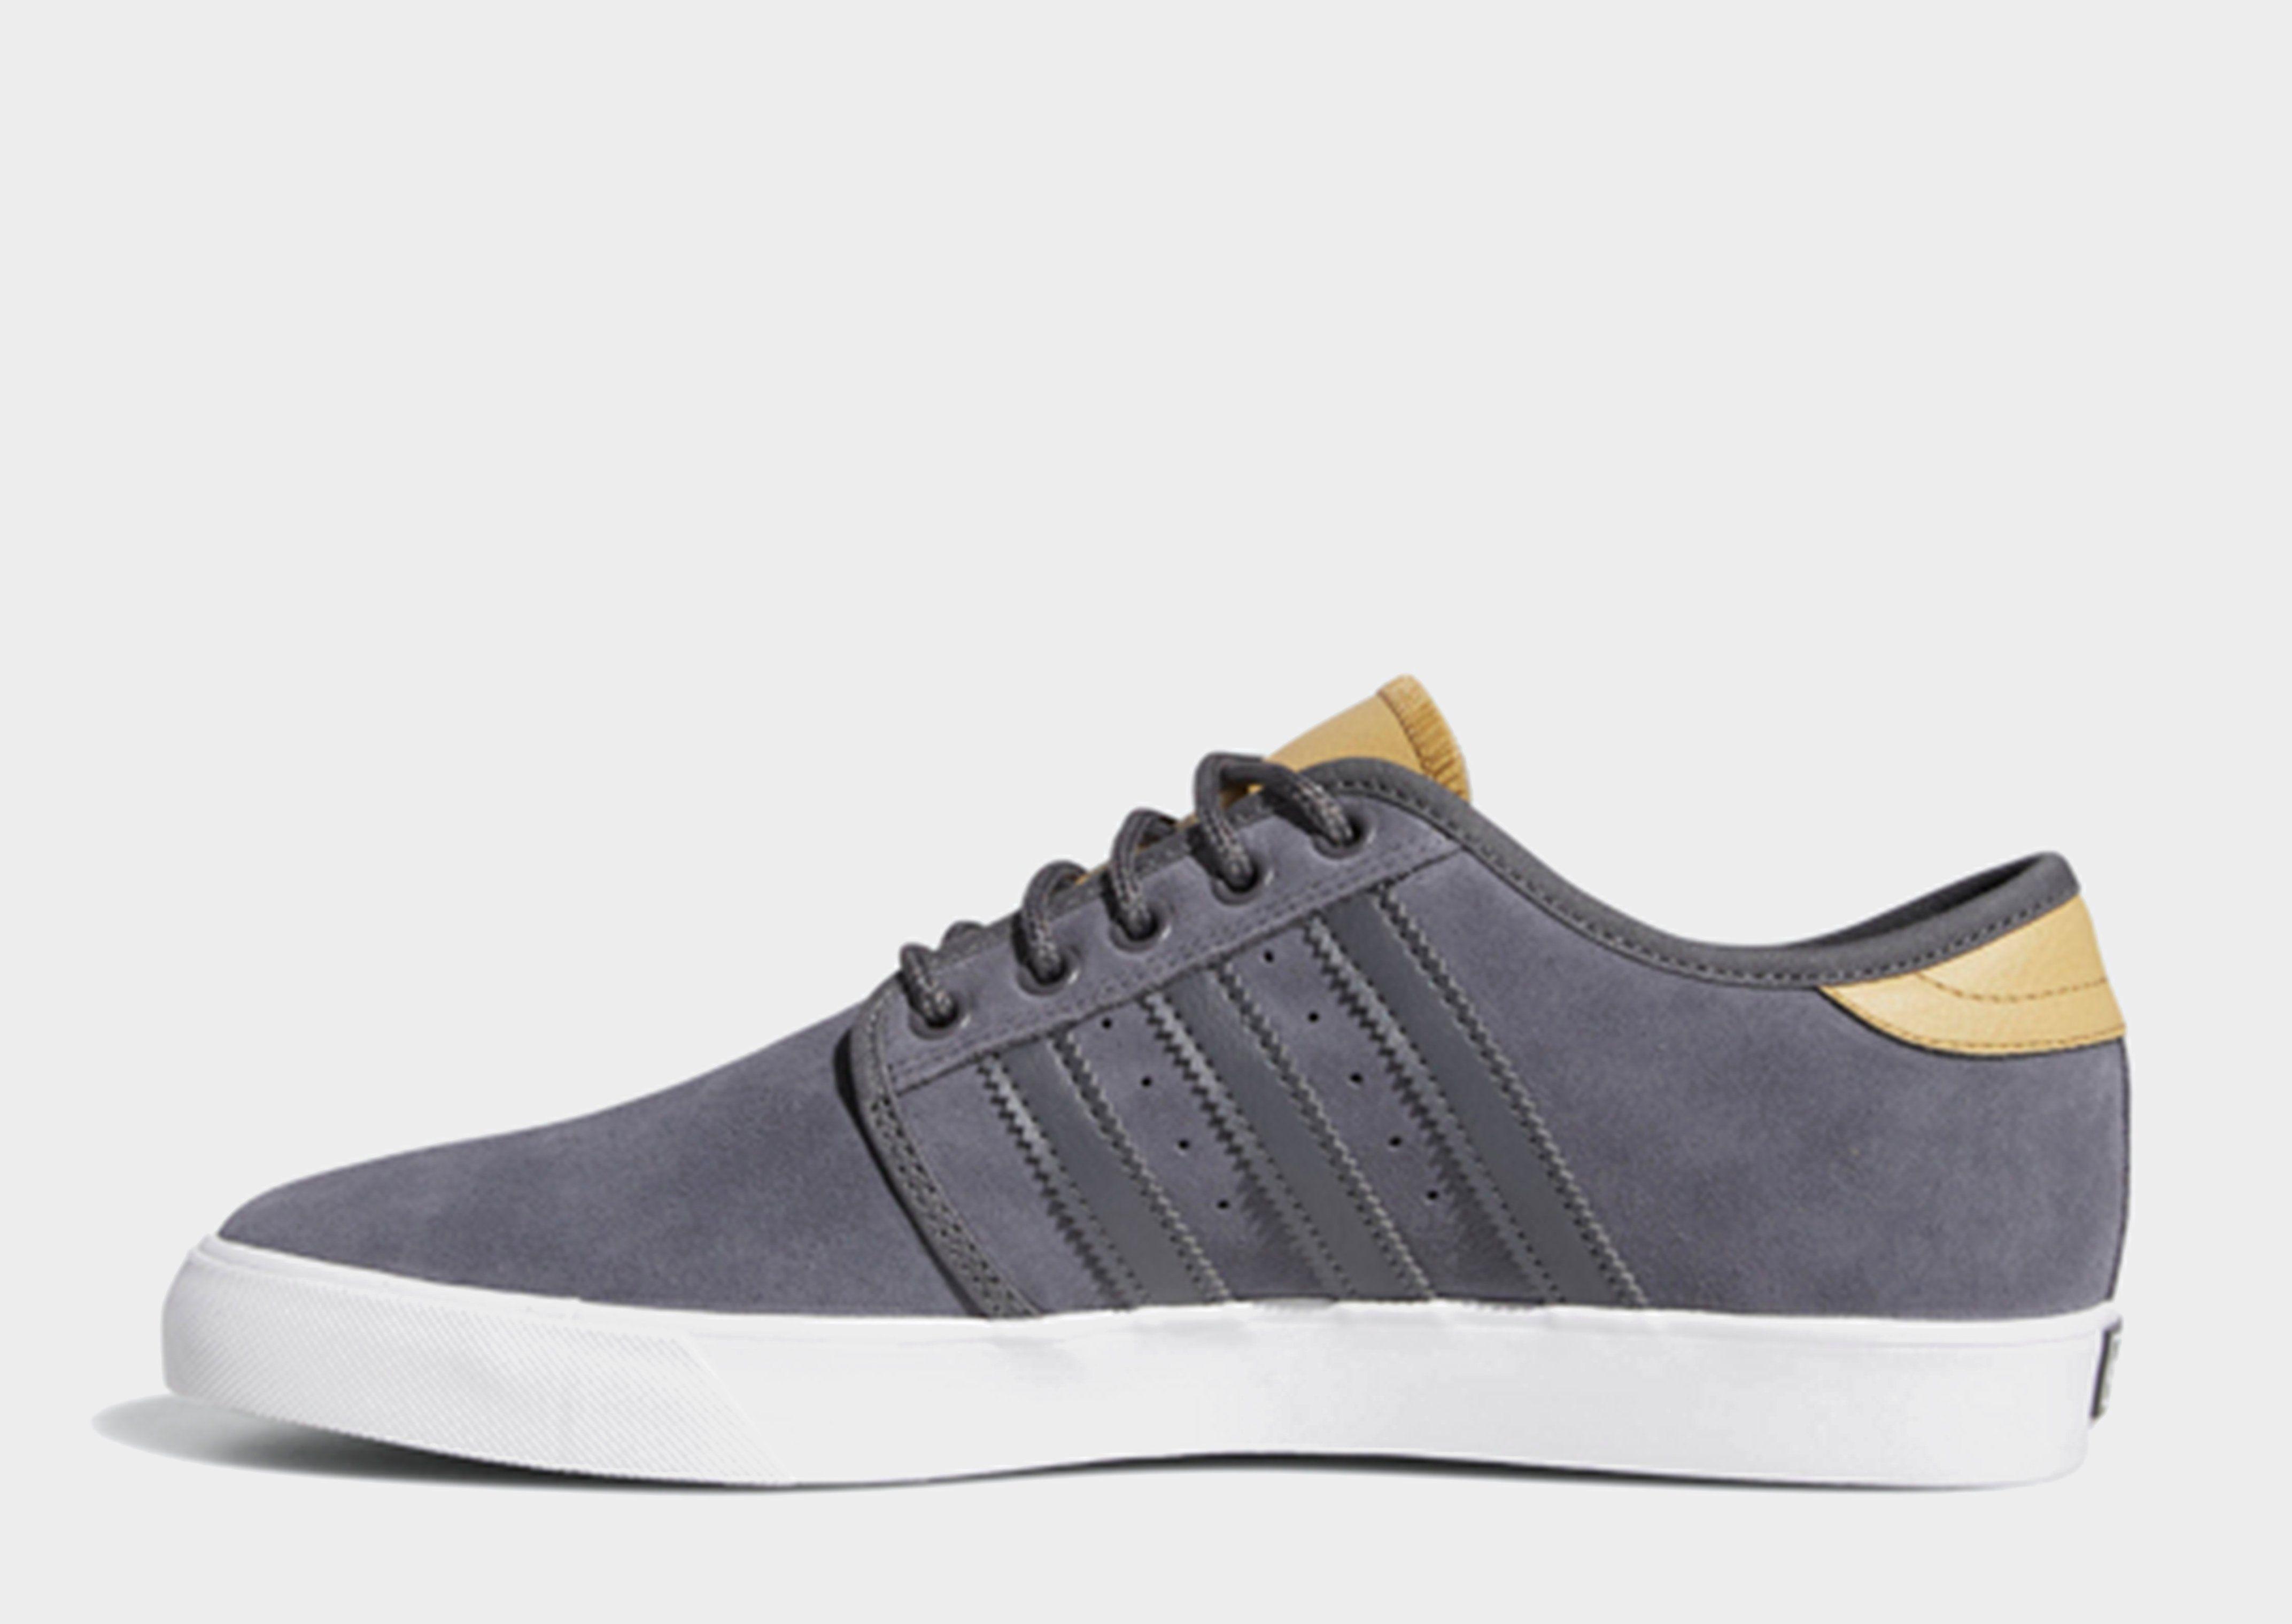 5a7339e12f4e ADIDAS Seeley Shoes